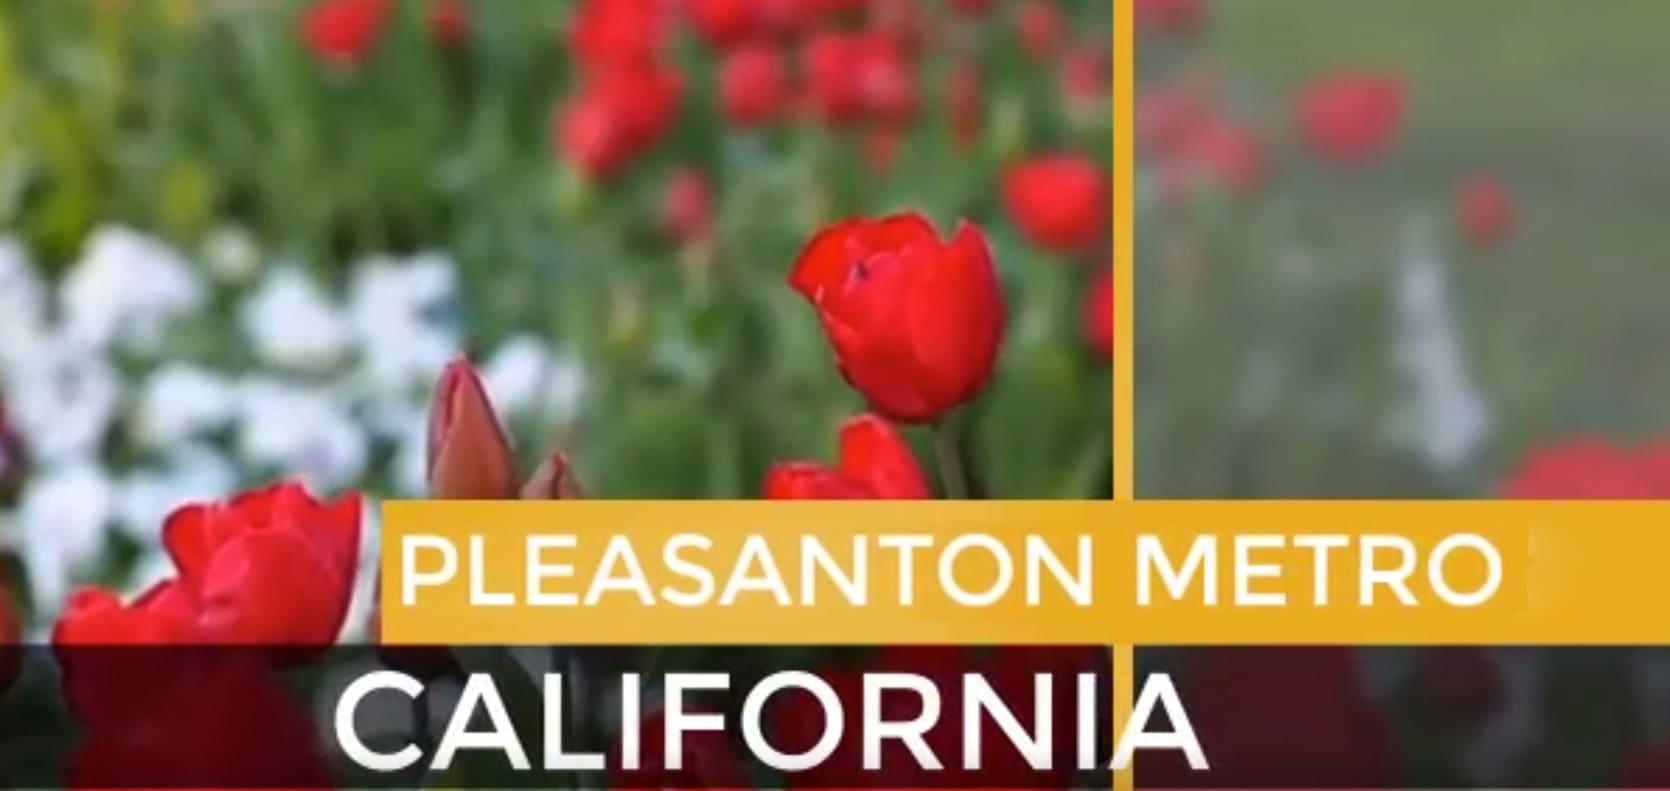 Pleasanton Metro video preview